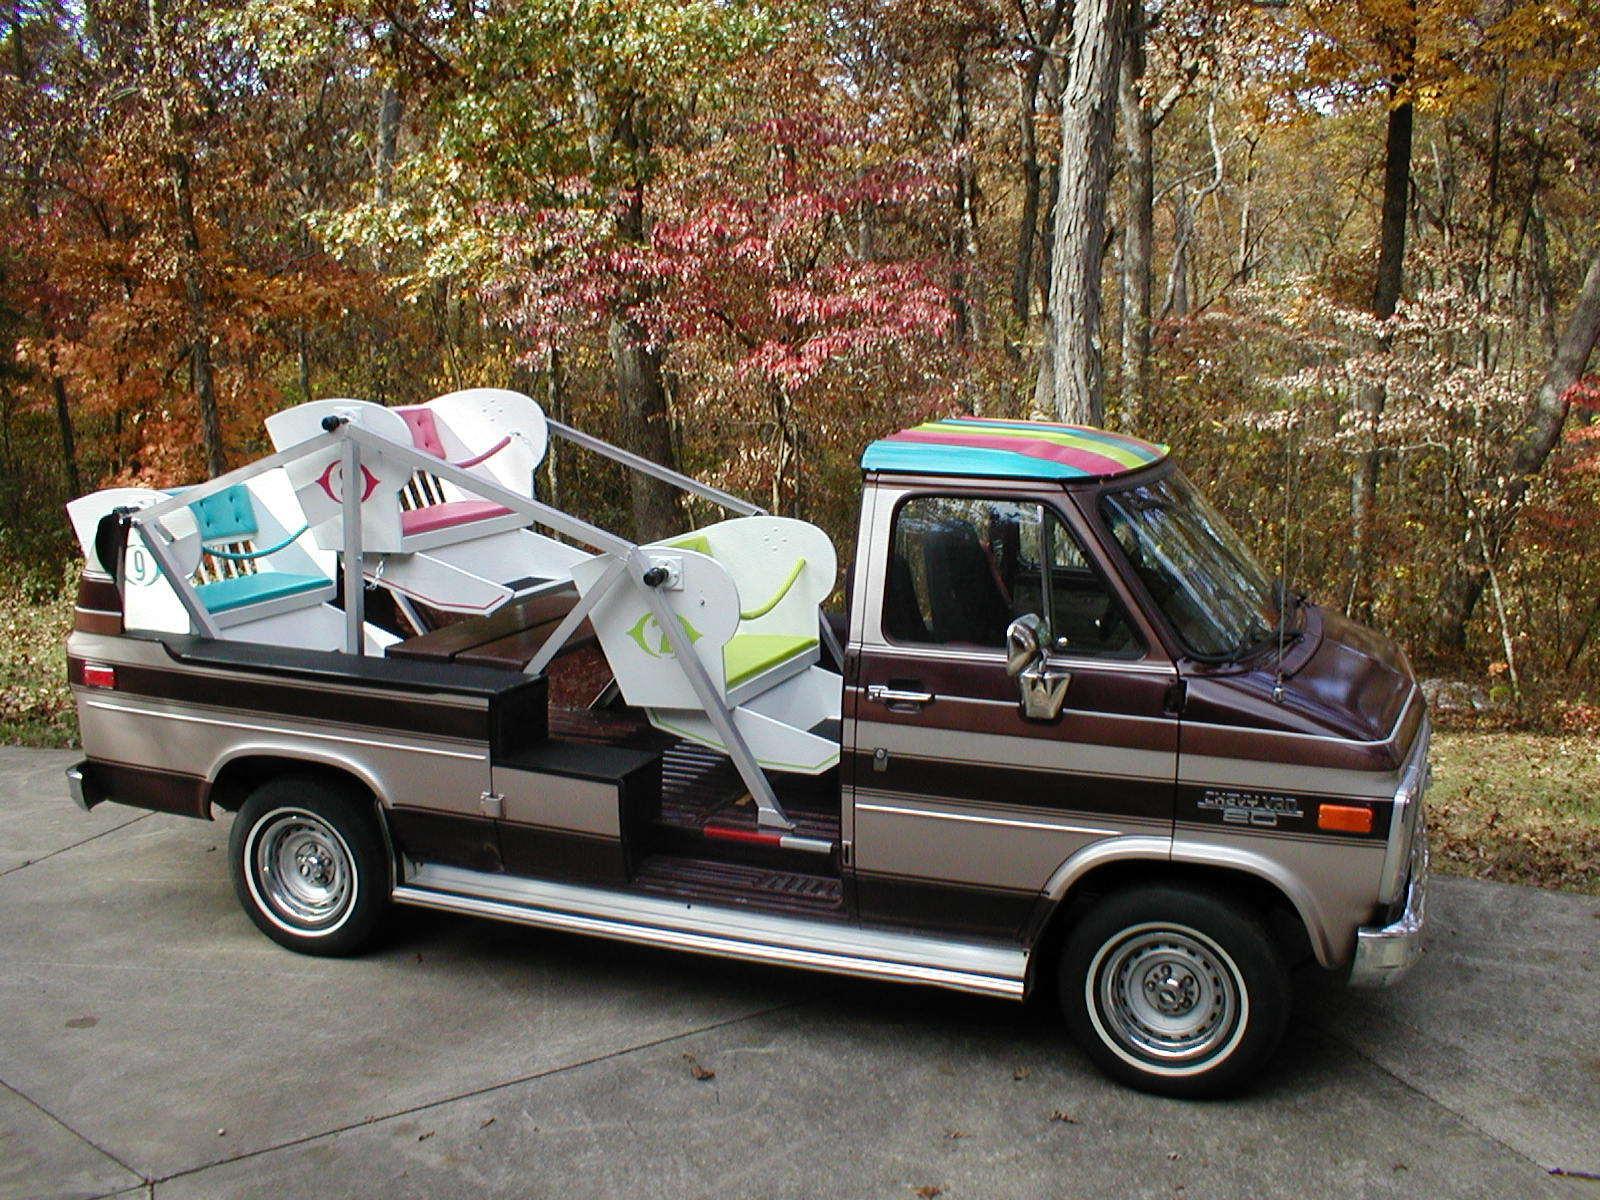 1989 Chevy Van With Ferris Wheel Seating